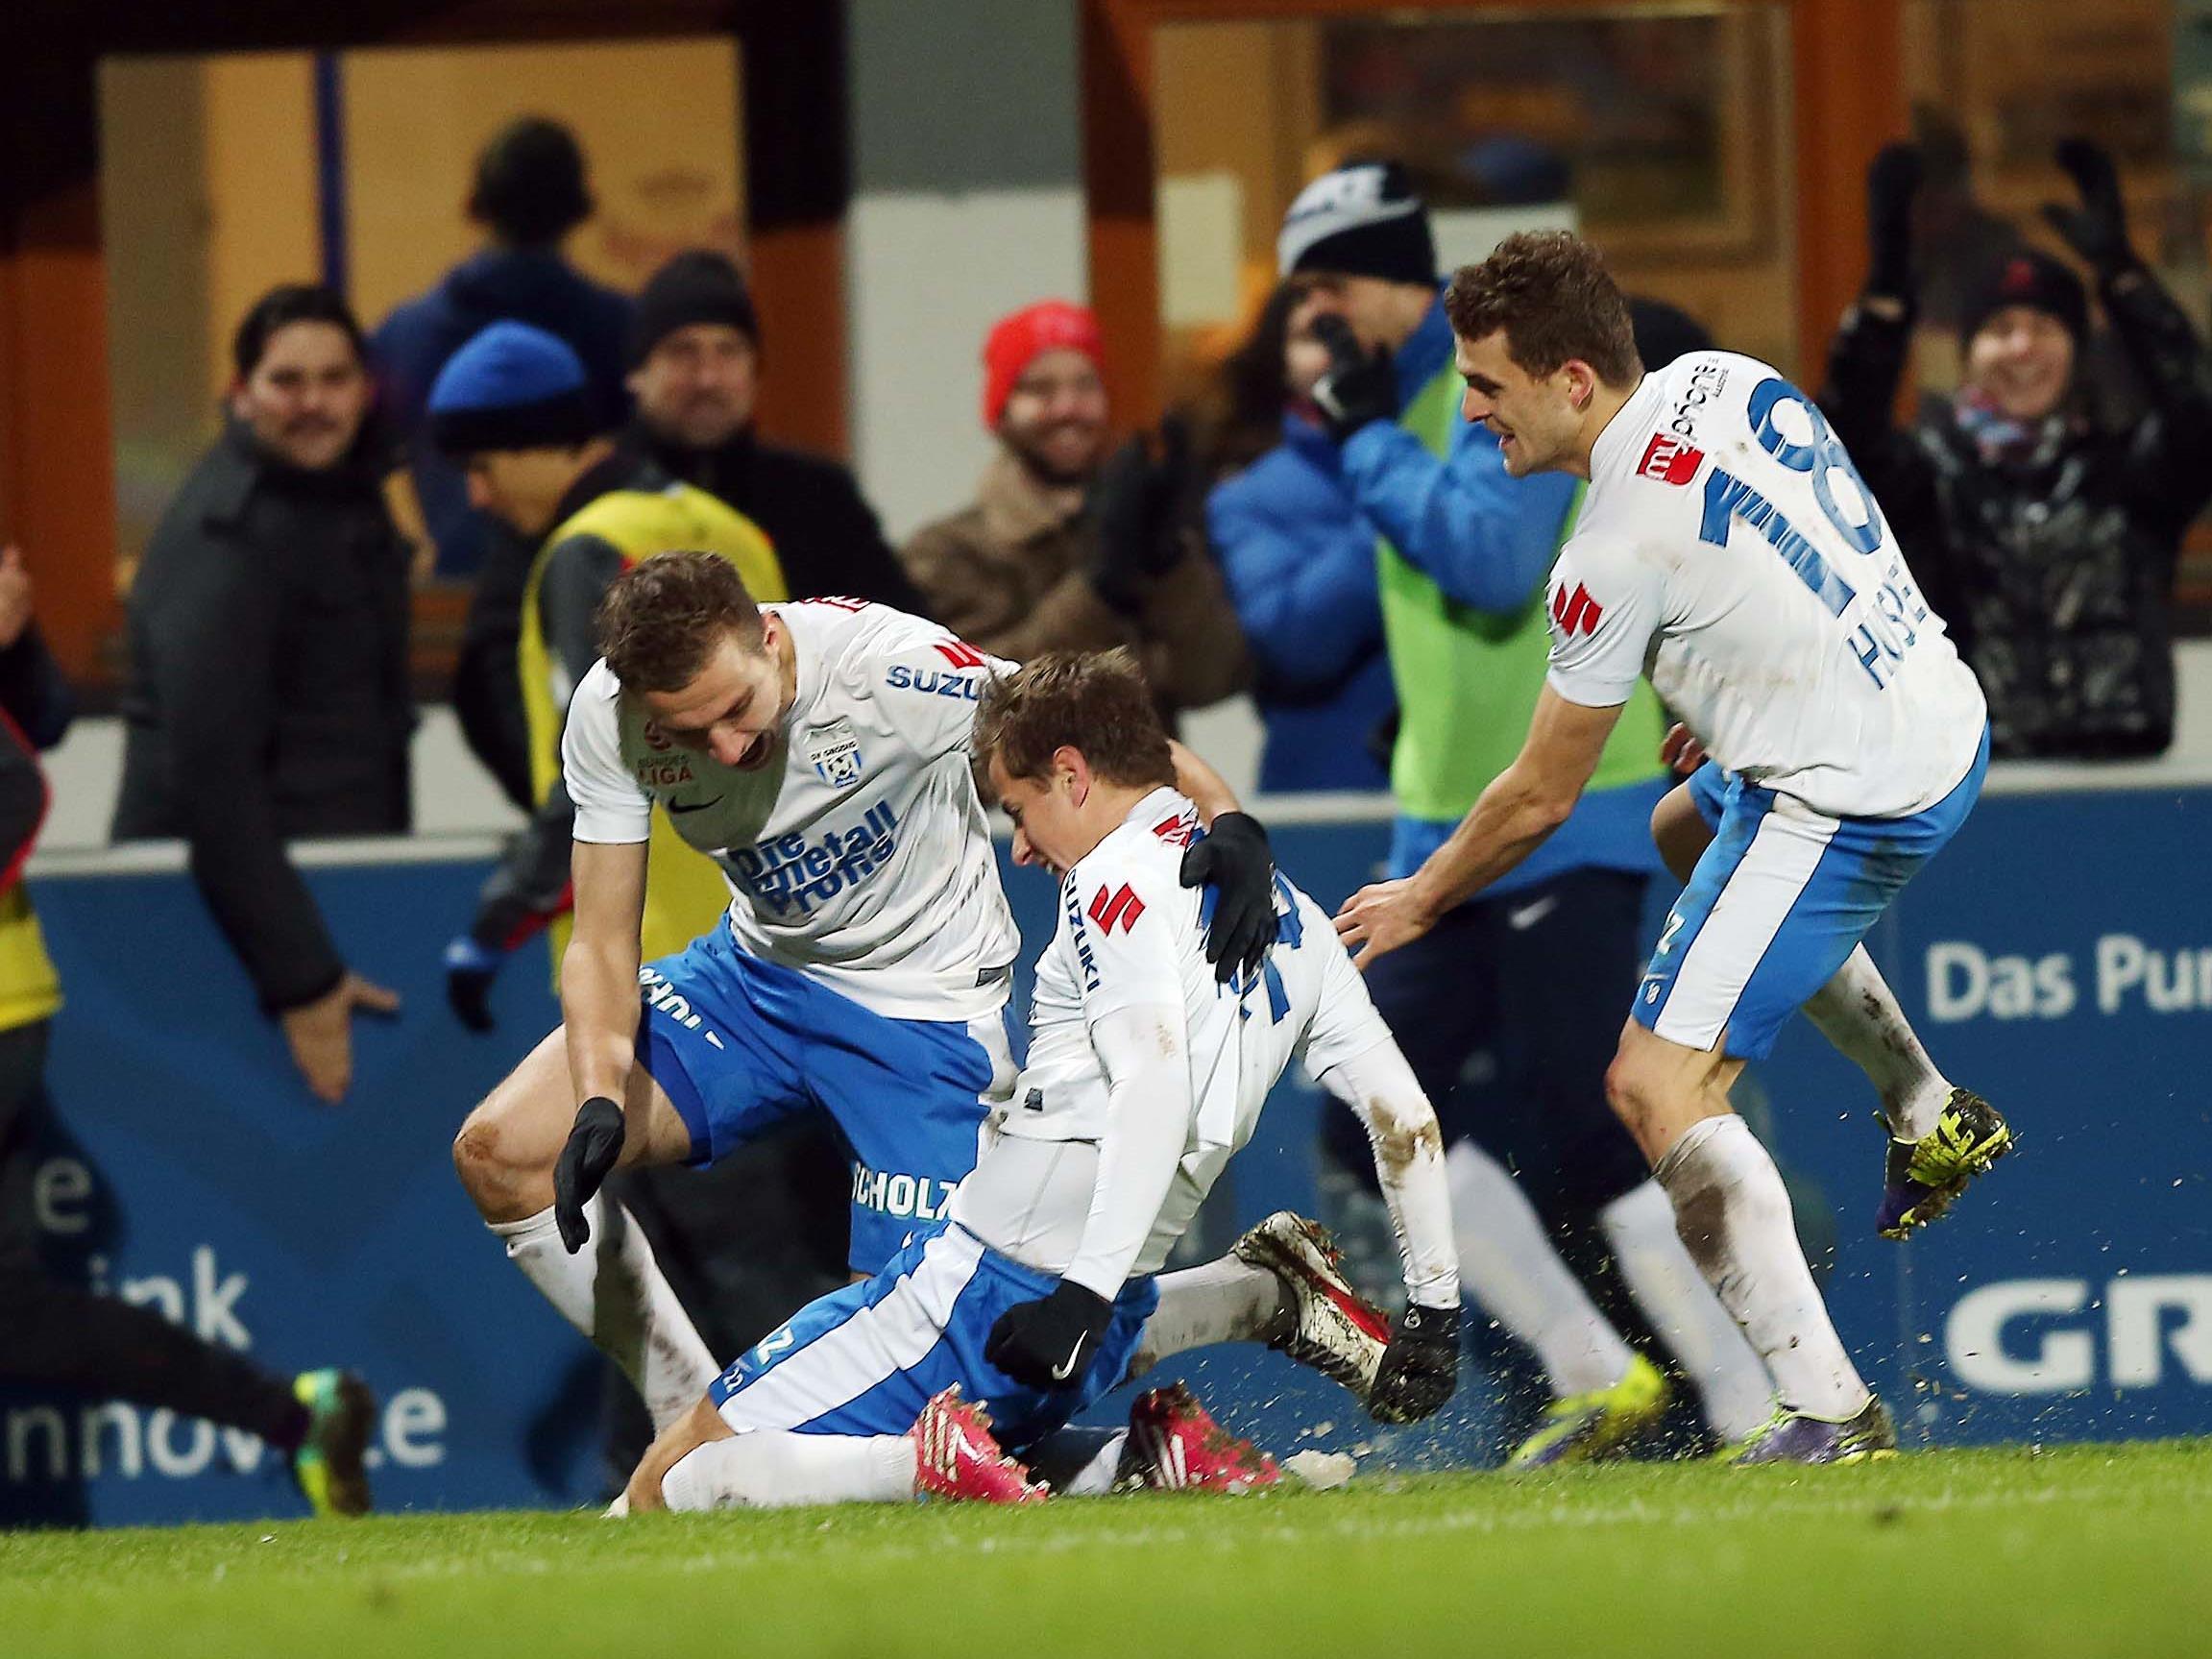 Grödig - Austria 3 - Aufsteiger bezwang Meister 1:0